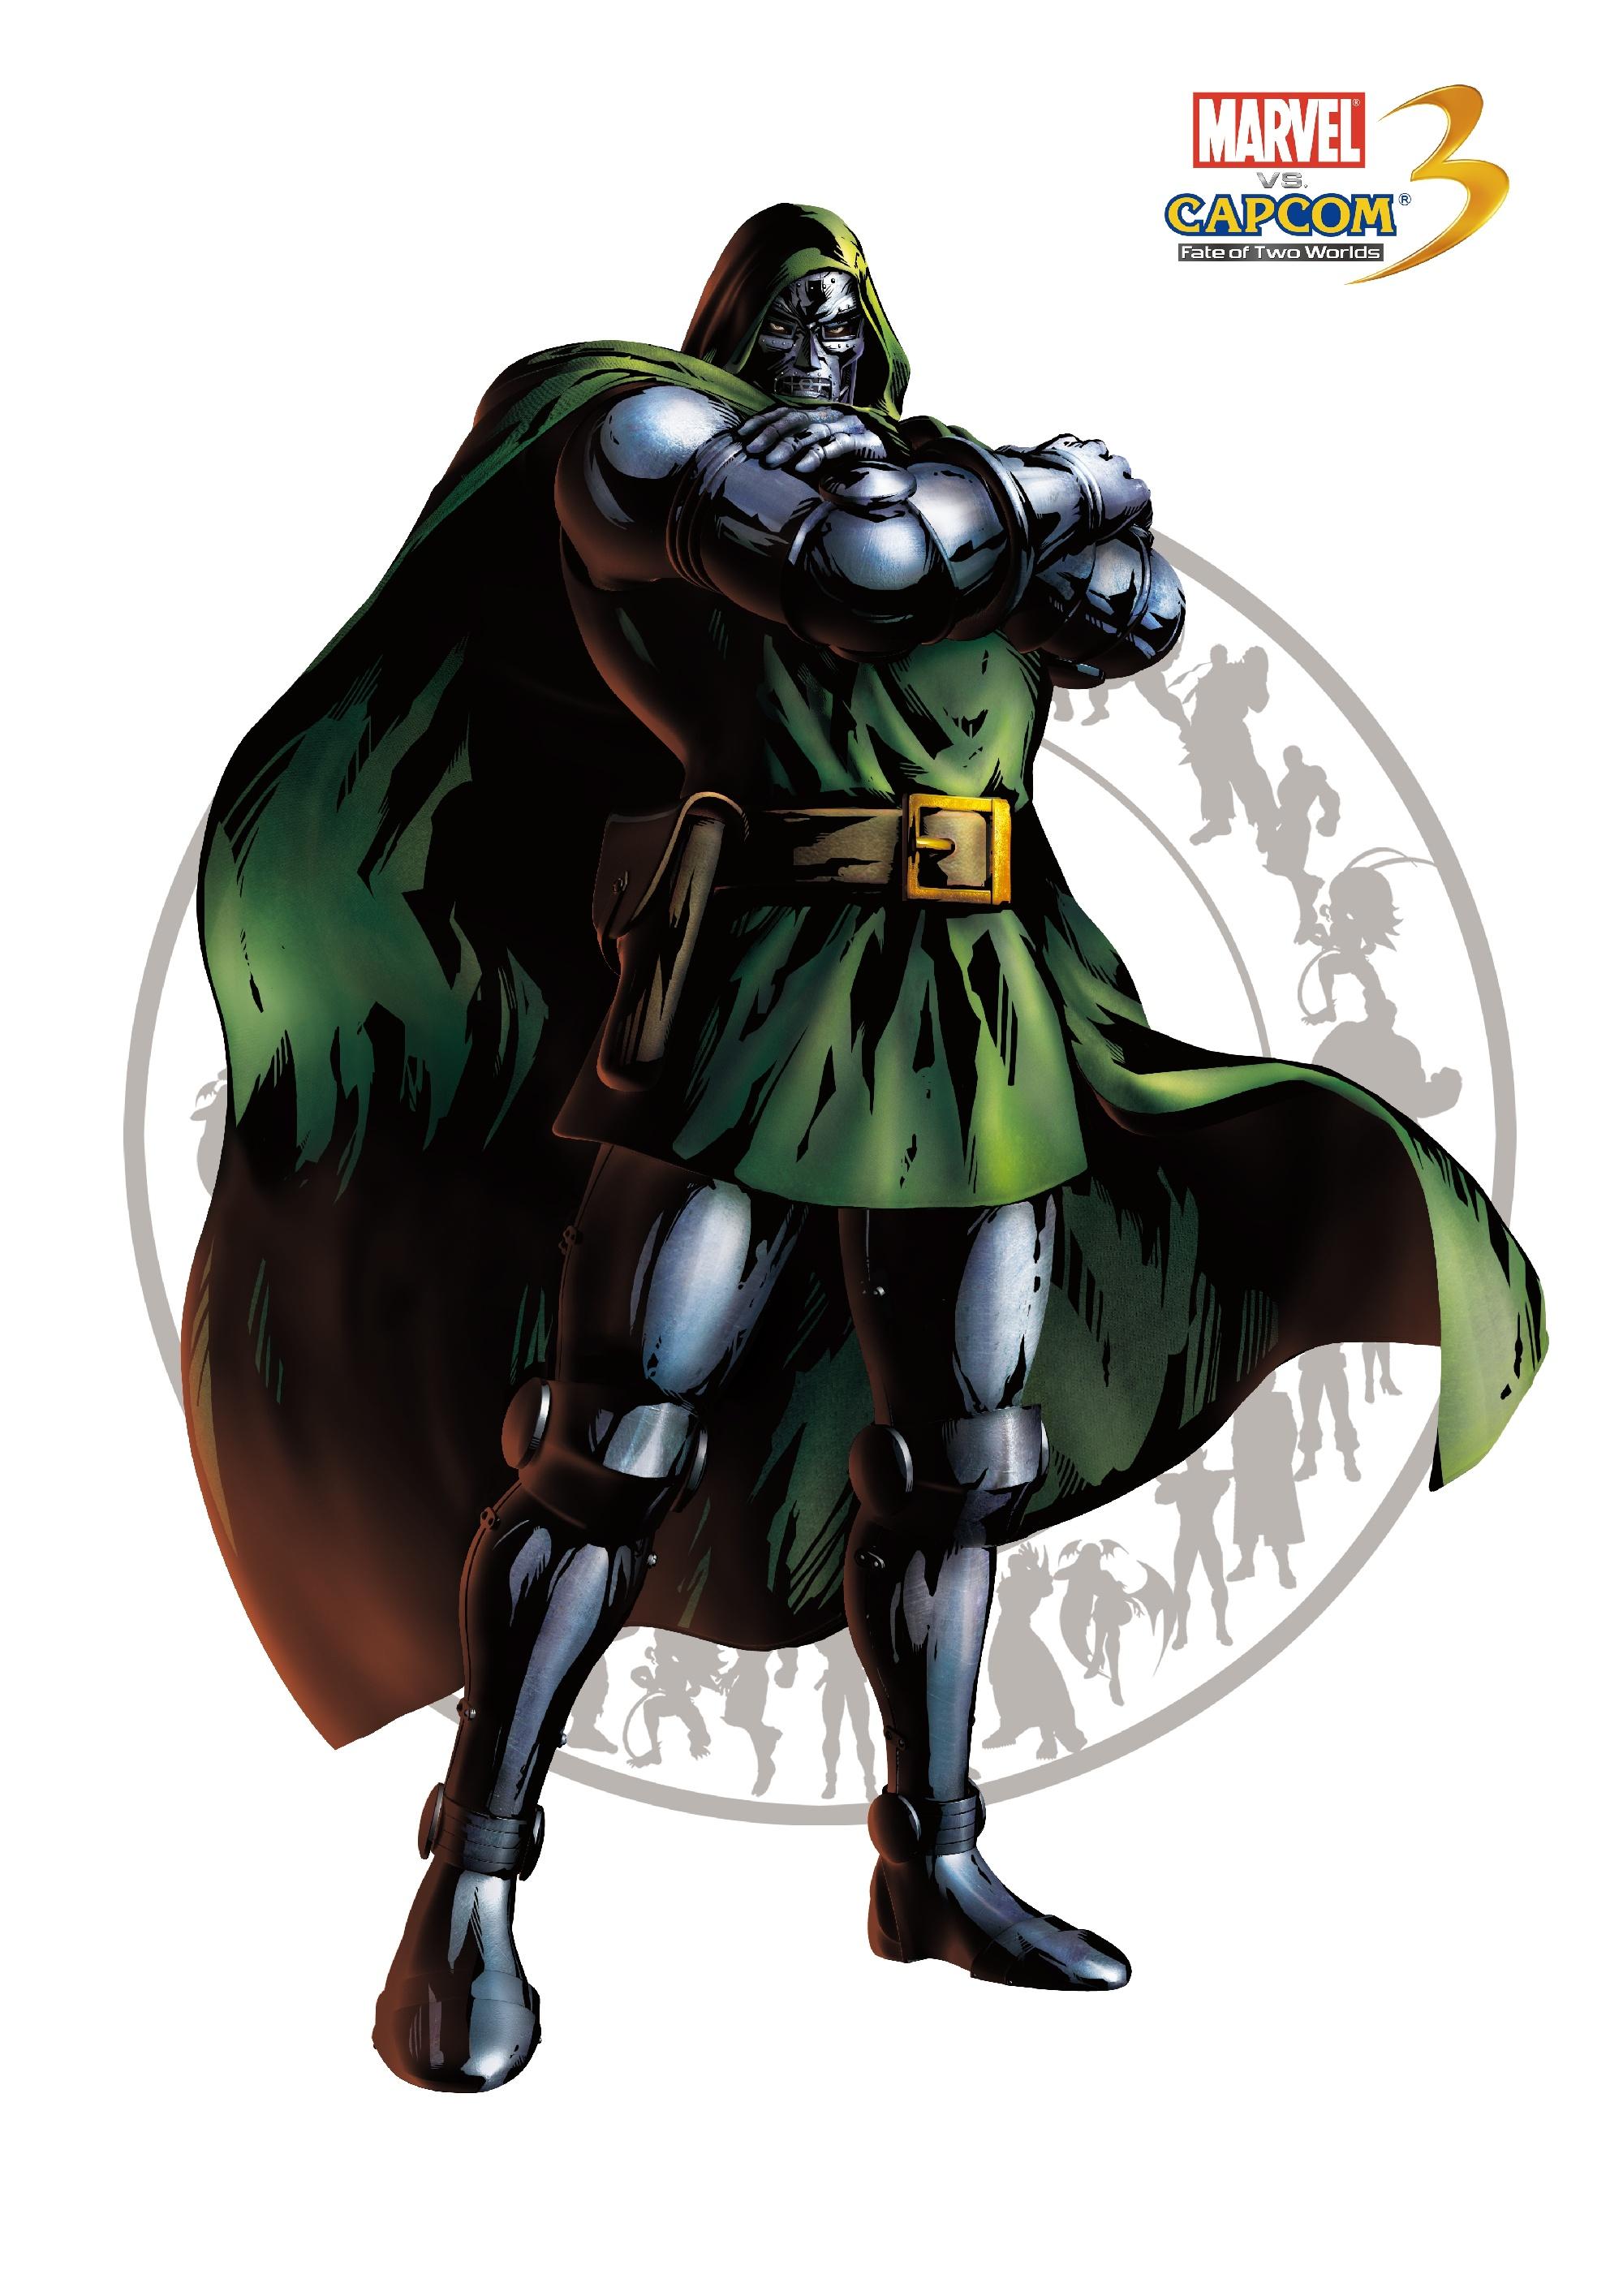 Доктор Дум - Marvel vs. Capcom 3: Fate of Two Worlds Арт, Персонаж